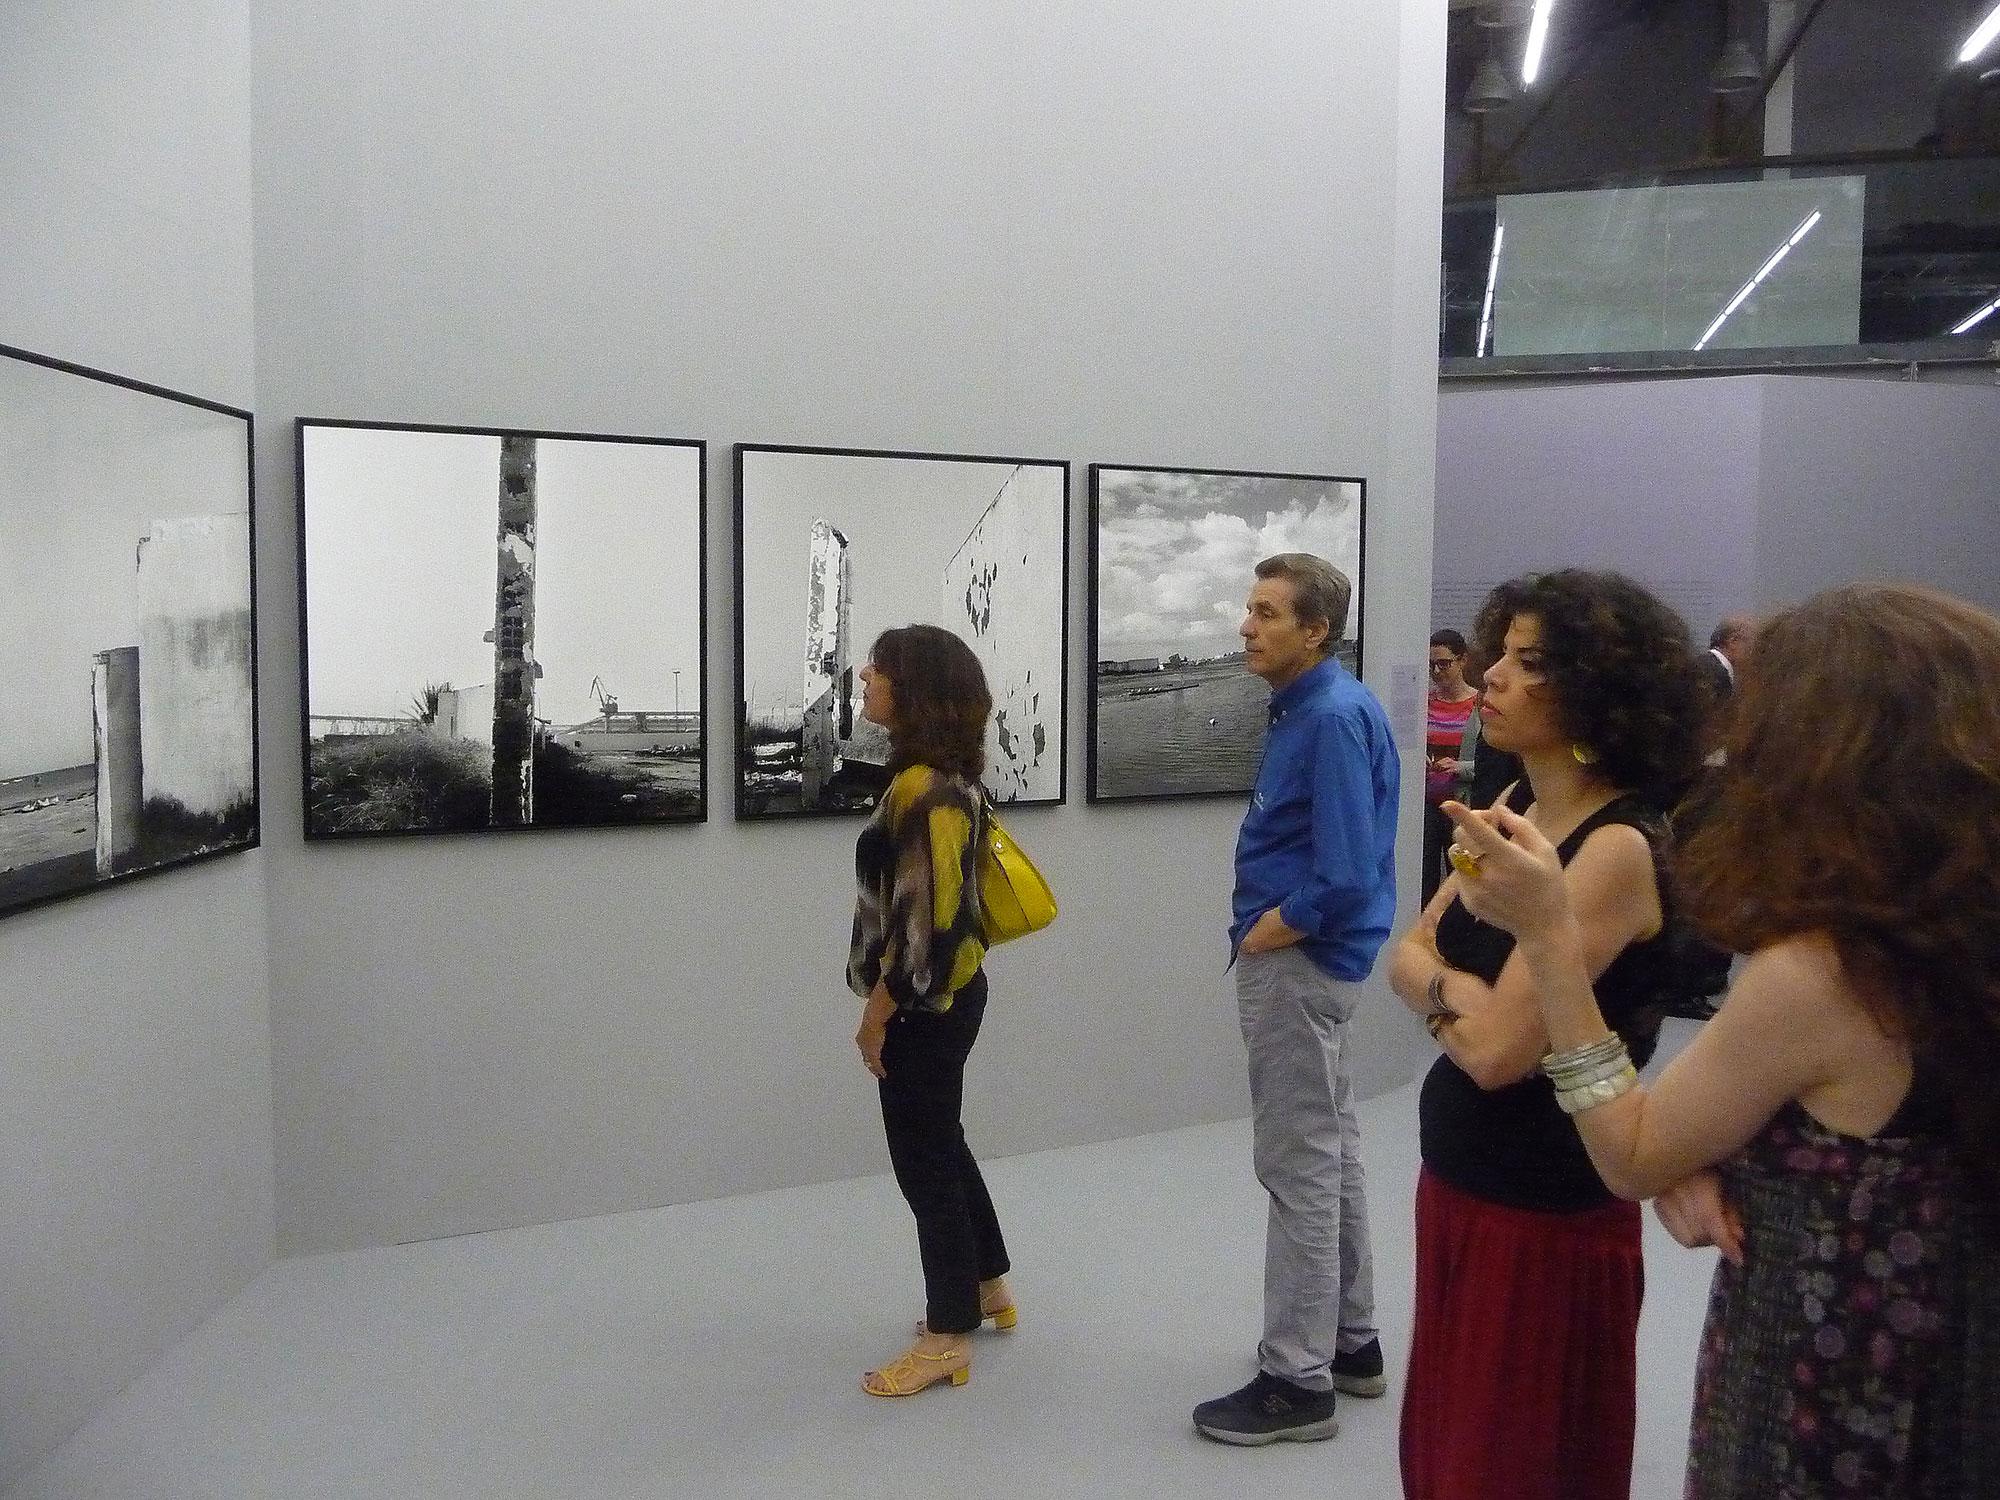 Mouna Karray, Murmurer, MAXXI Museum, Rome